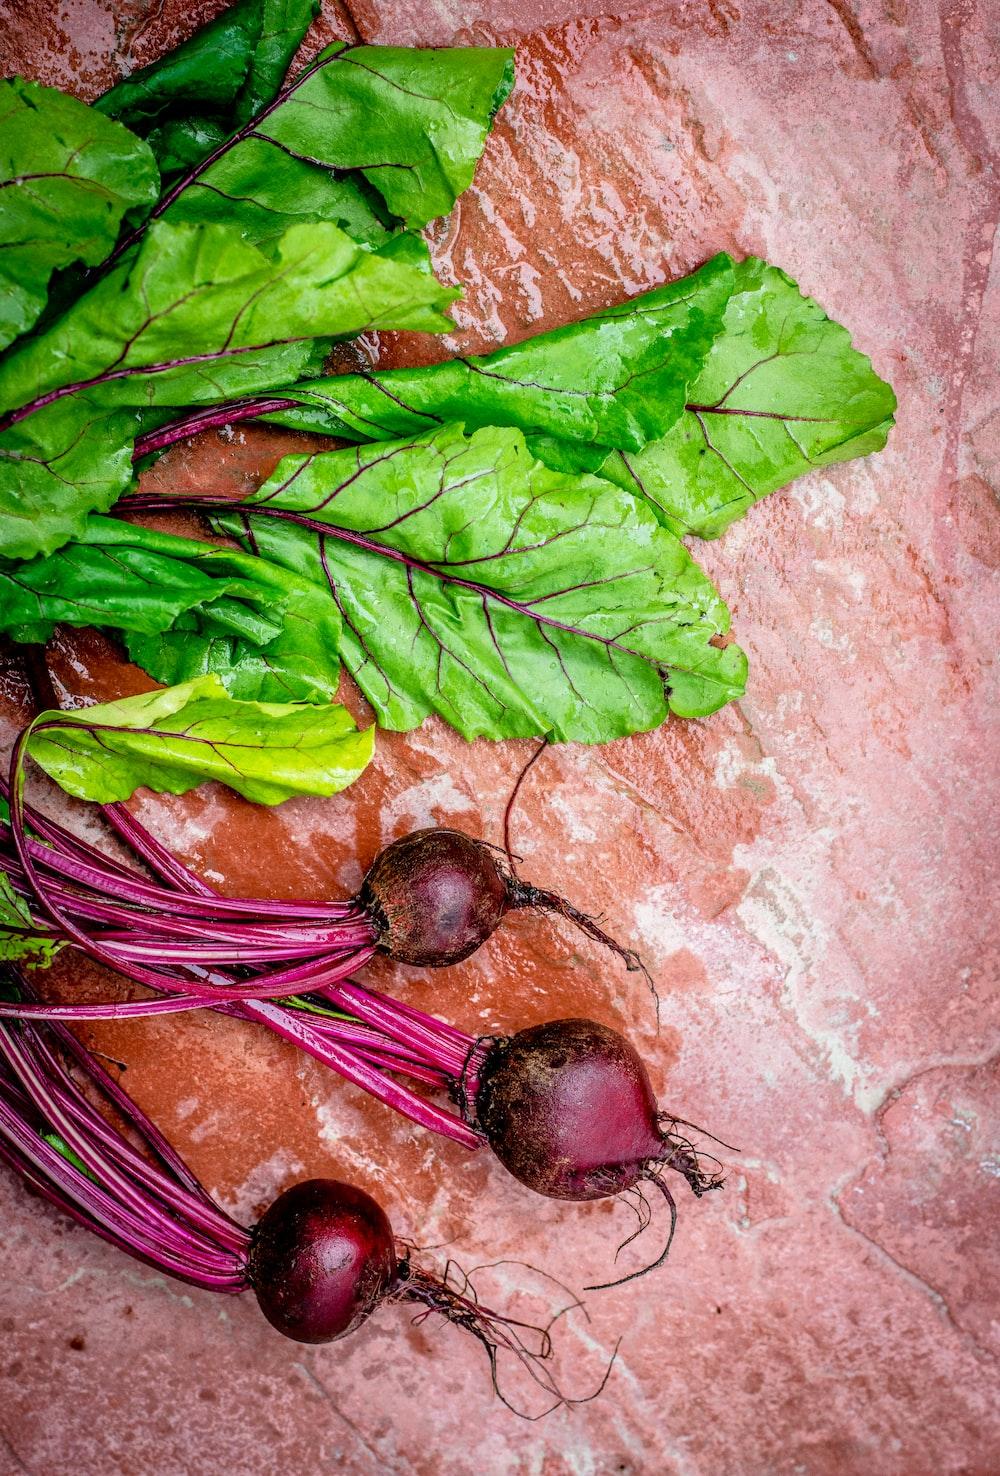 focus photo of green vegetable